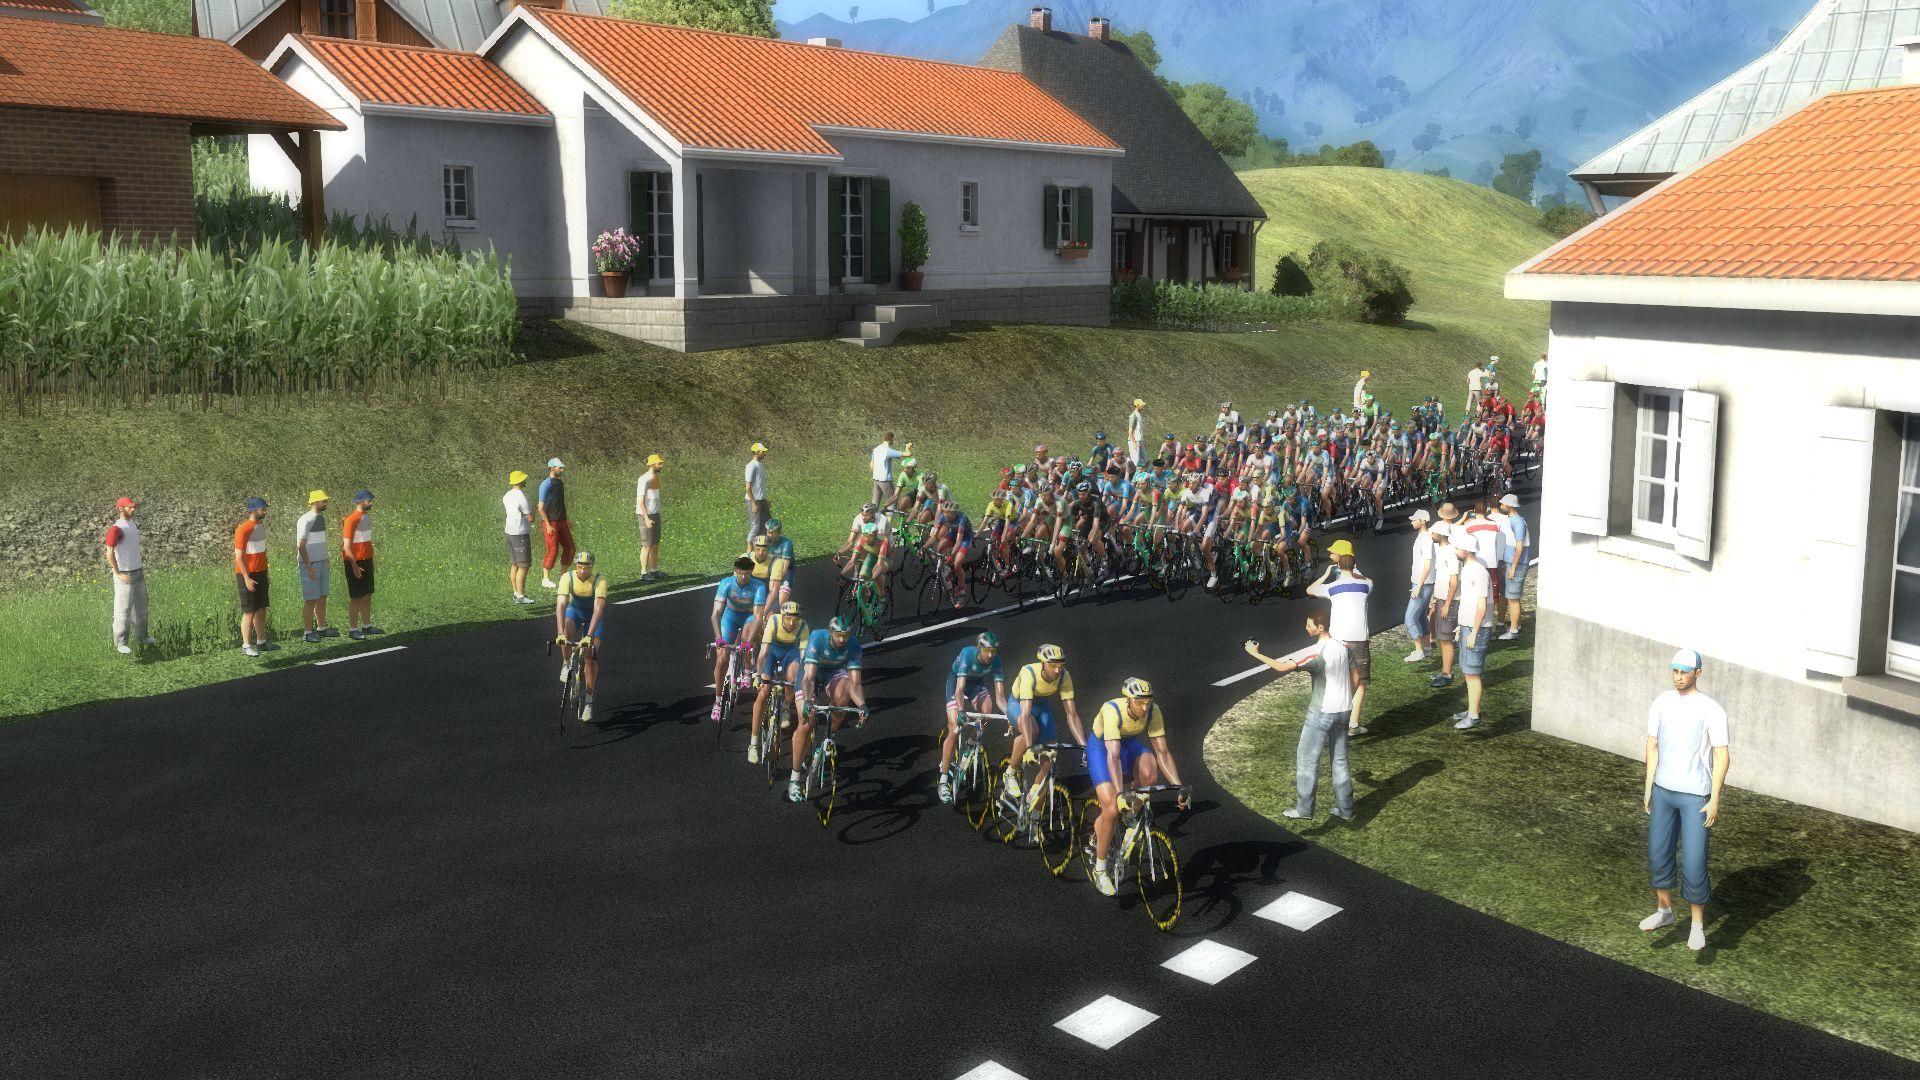 pcmdaily.com/images/mg/2020/Reports/HC/Austria/S2/mg20_austria_s02_28.jpg